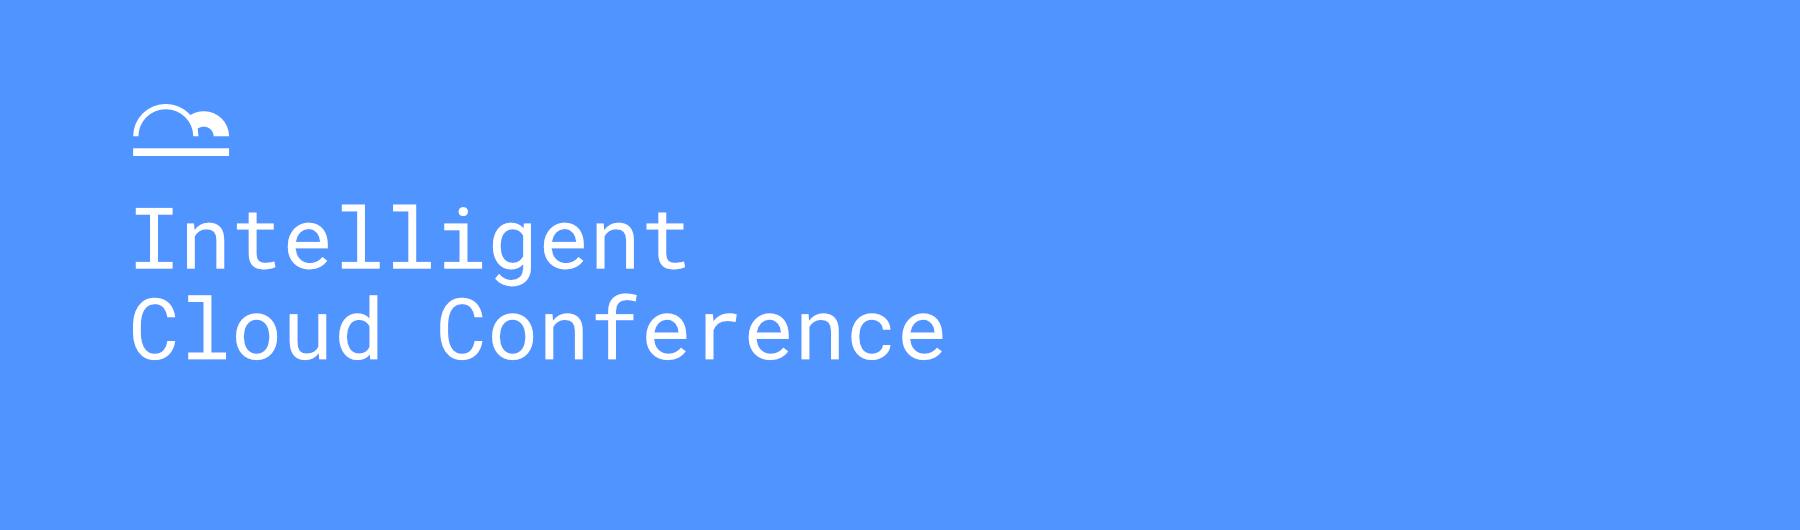 Intelligent Cloud Conference 2018